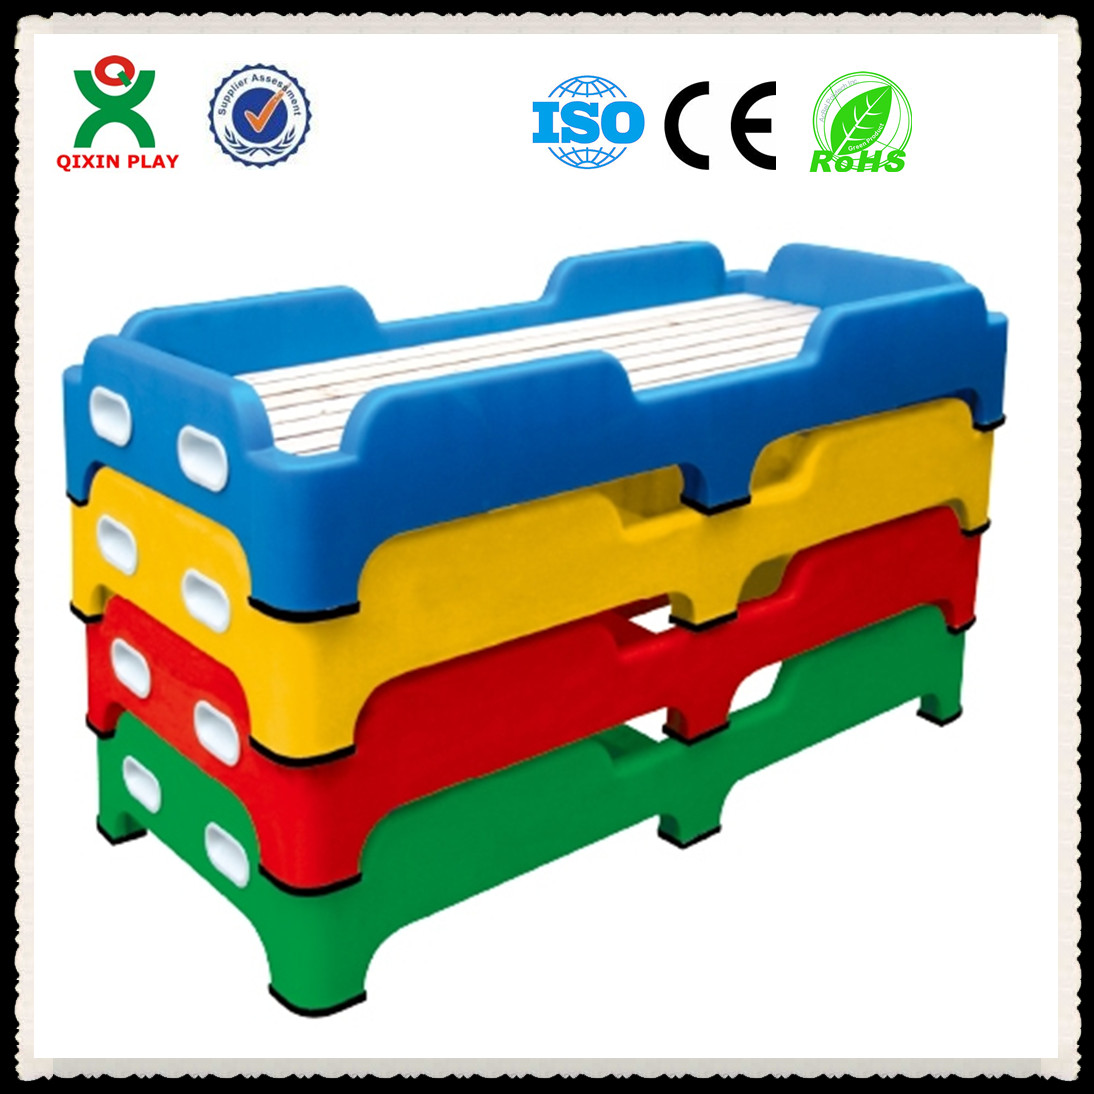 China barato de pl stico mobili rio infantil cama toys r - Sillones infantiles toysrus ...